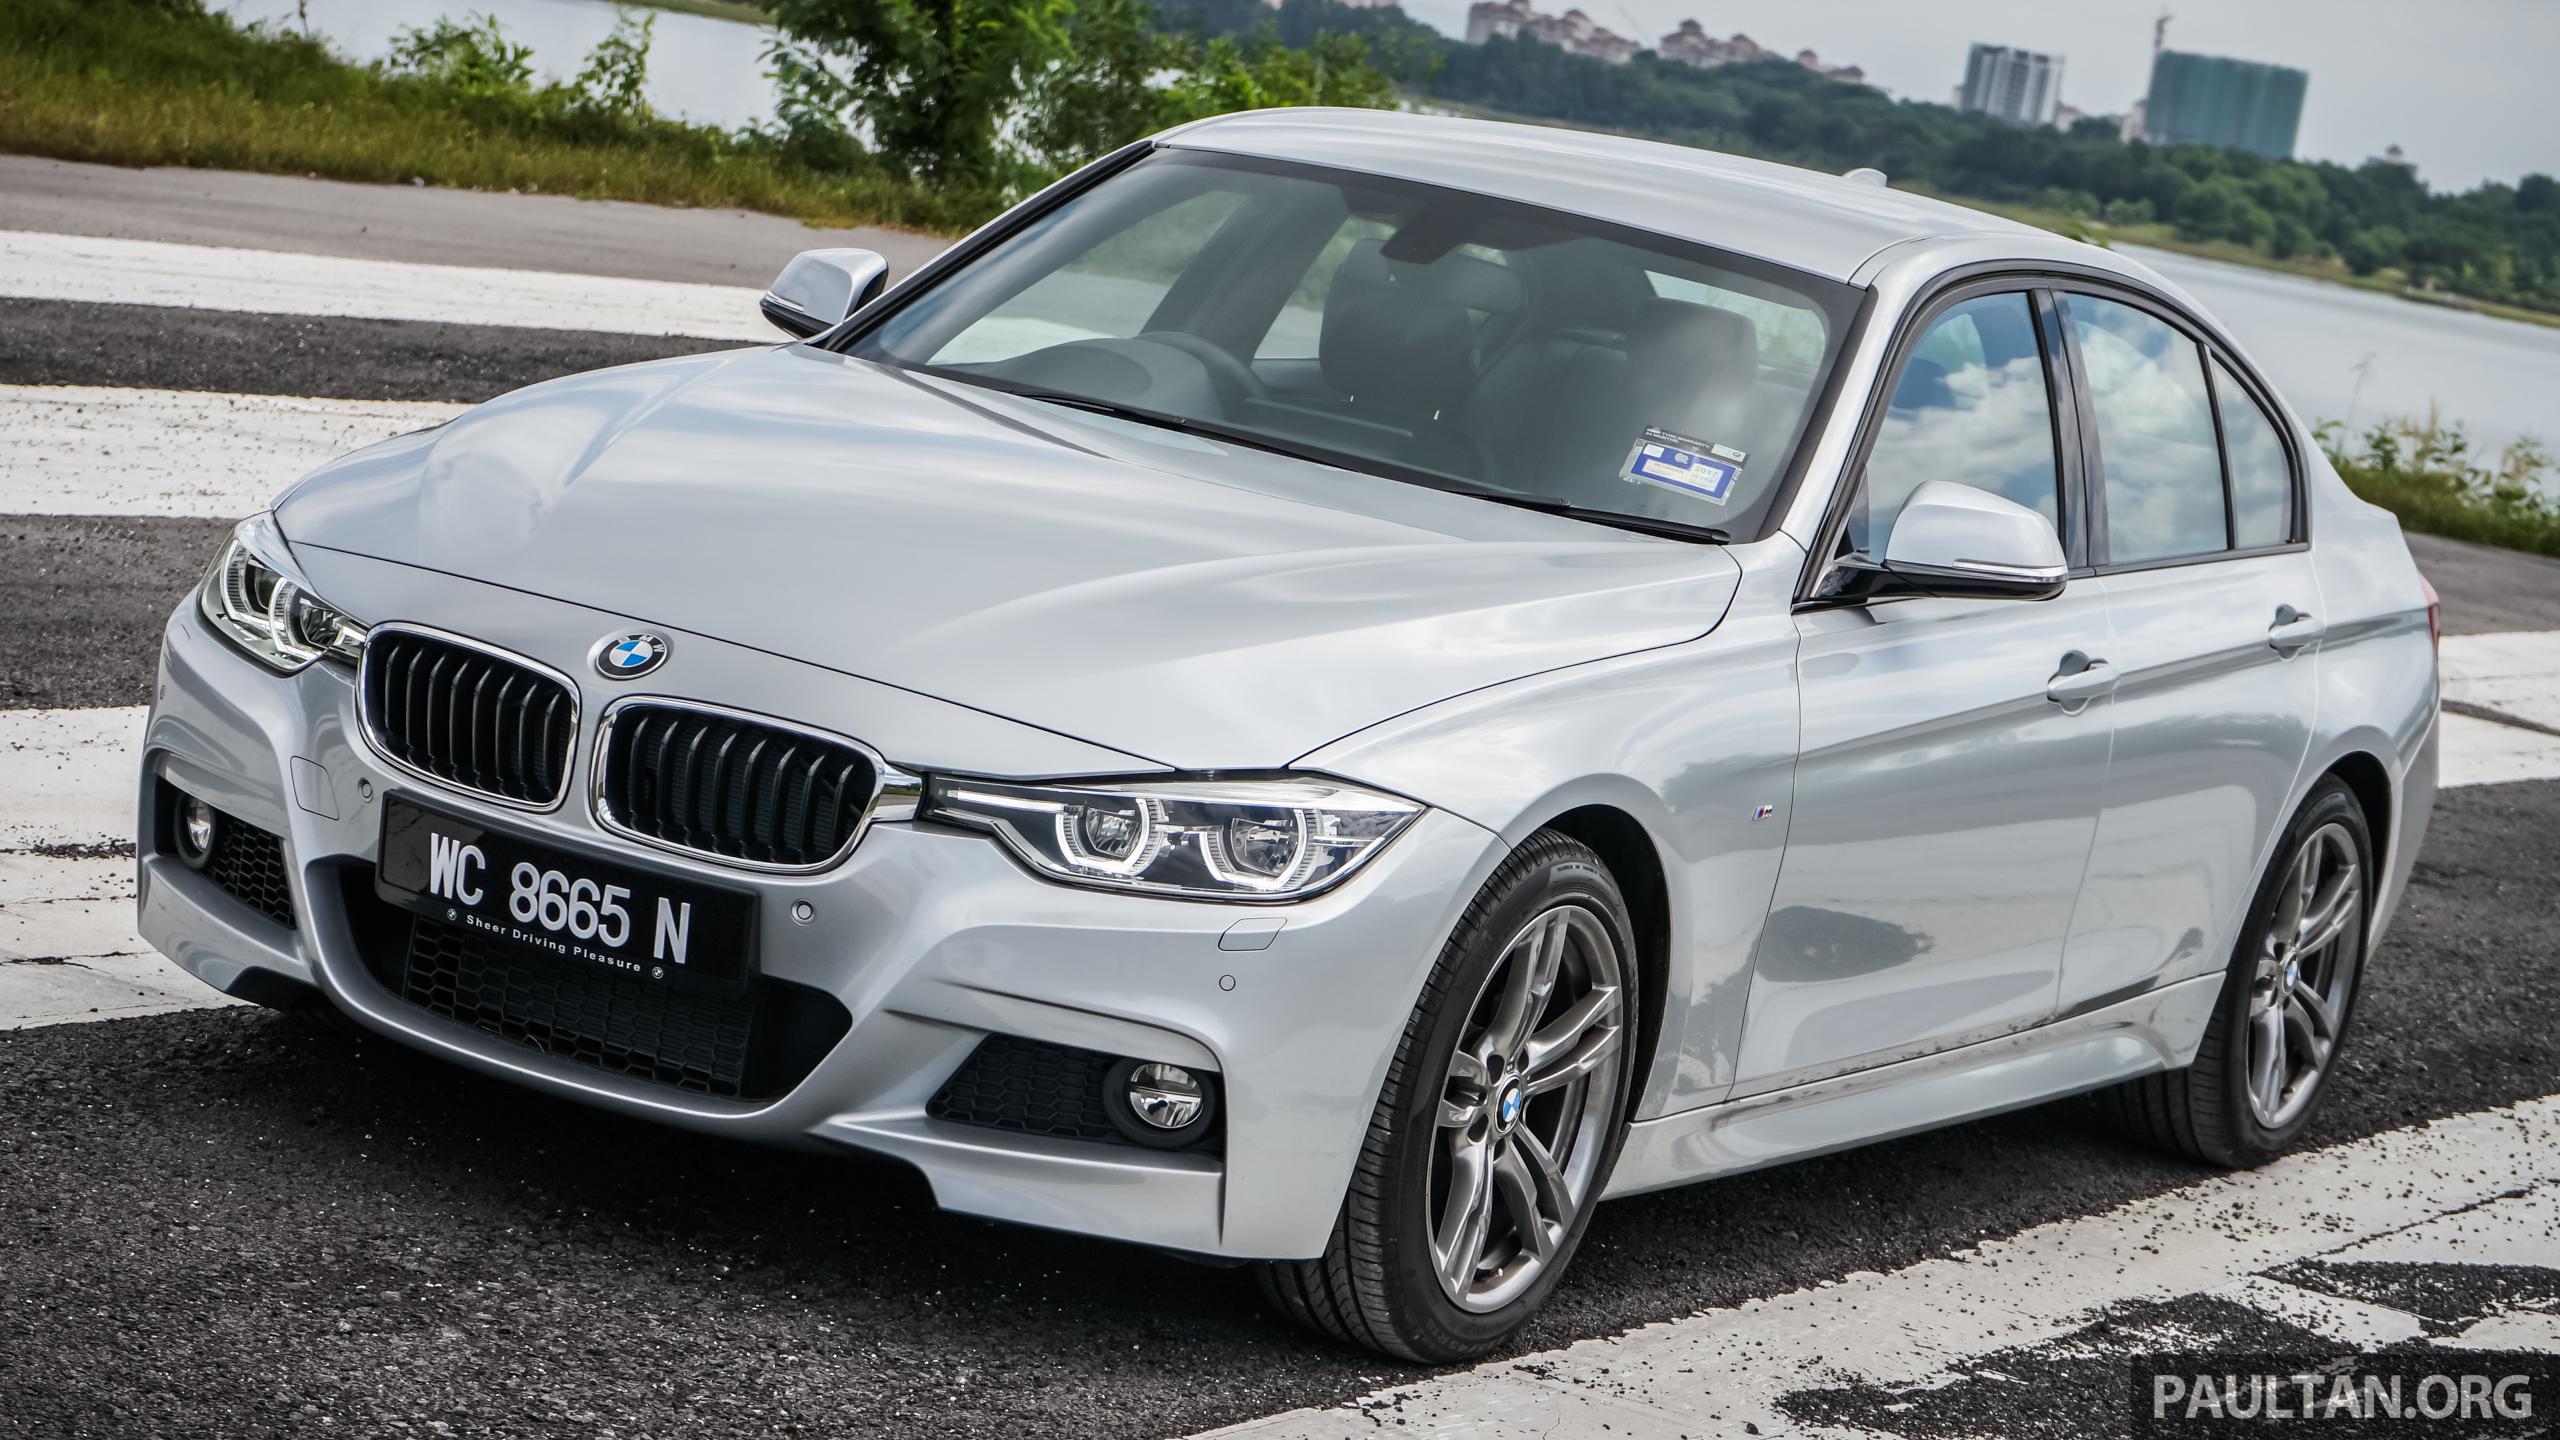 Bmw Malaysia Announces Promo Prices For 3 Series 5 Series